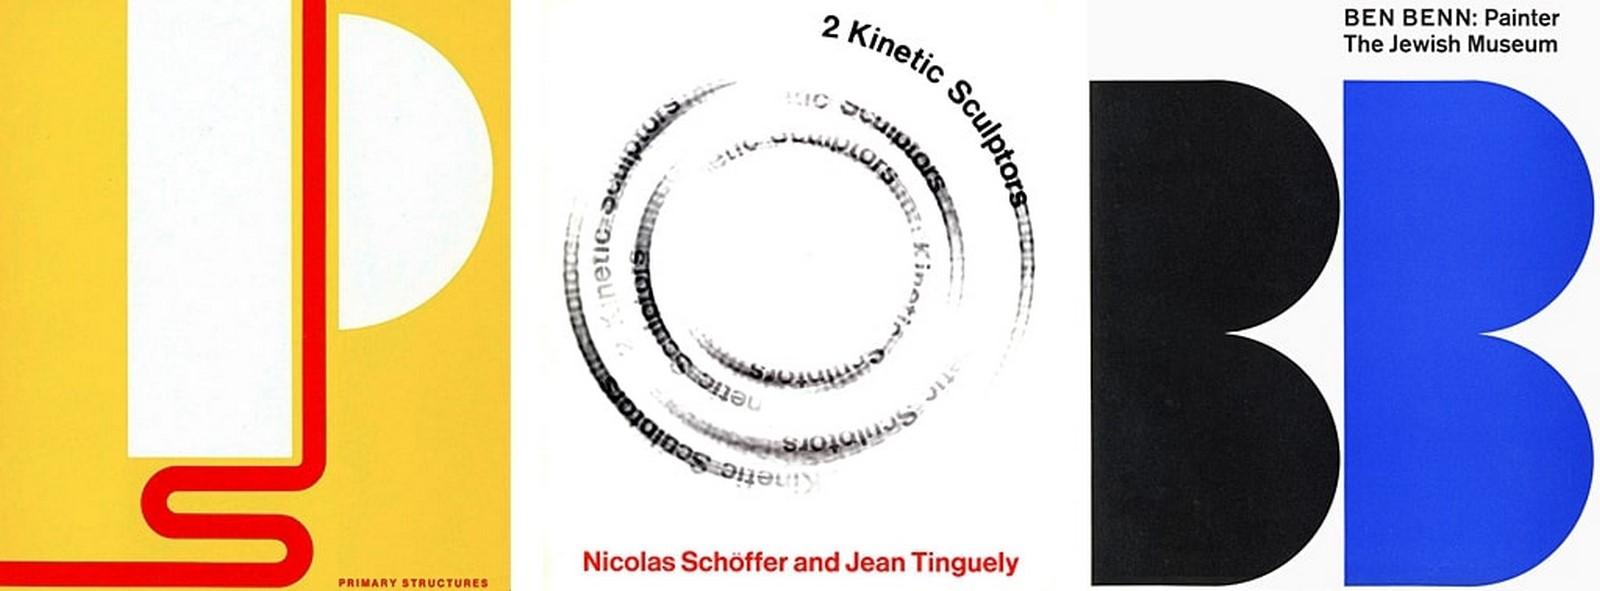 Elaine Lustig Cohen: Ideology and Philosophy - Sheet5